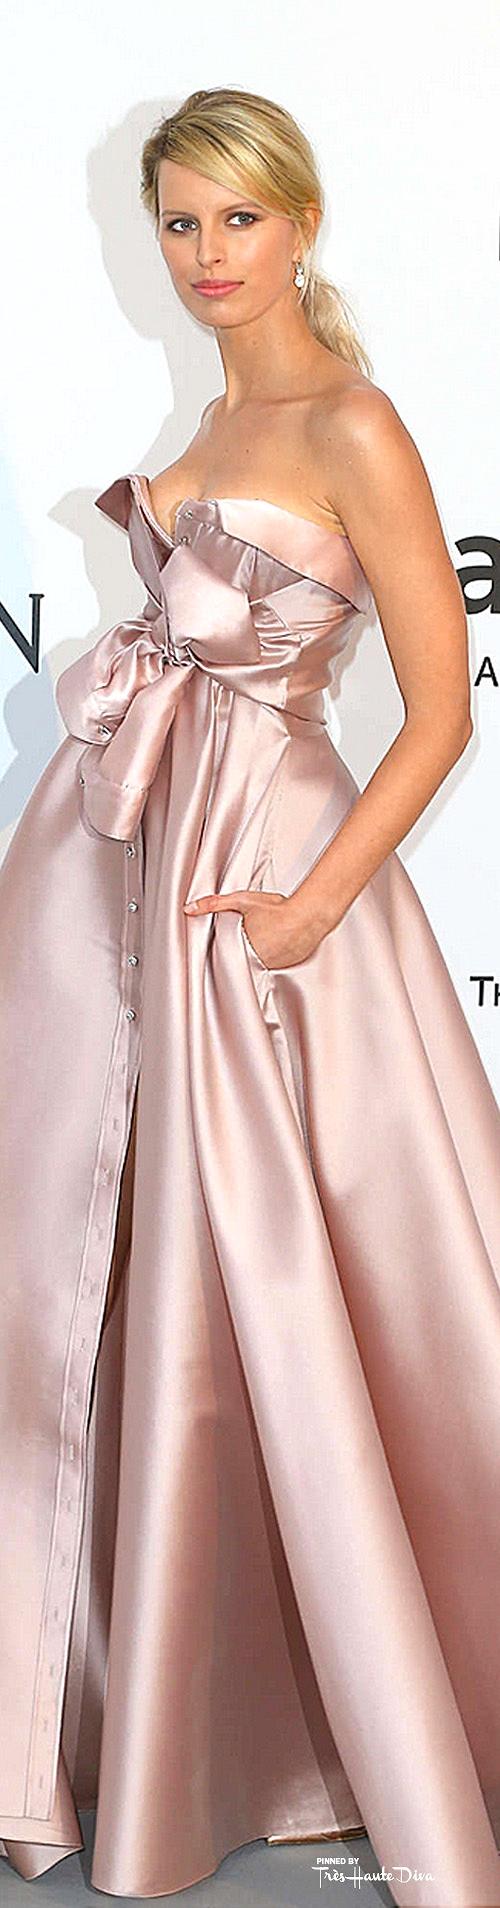 Karolina Kurkova in an Alexis Mabille Couture